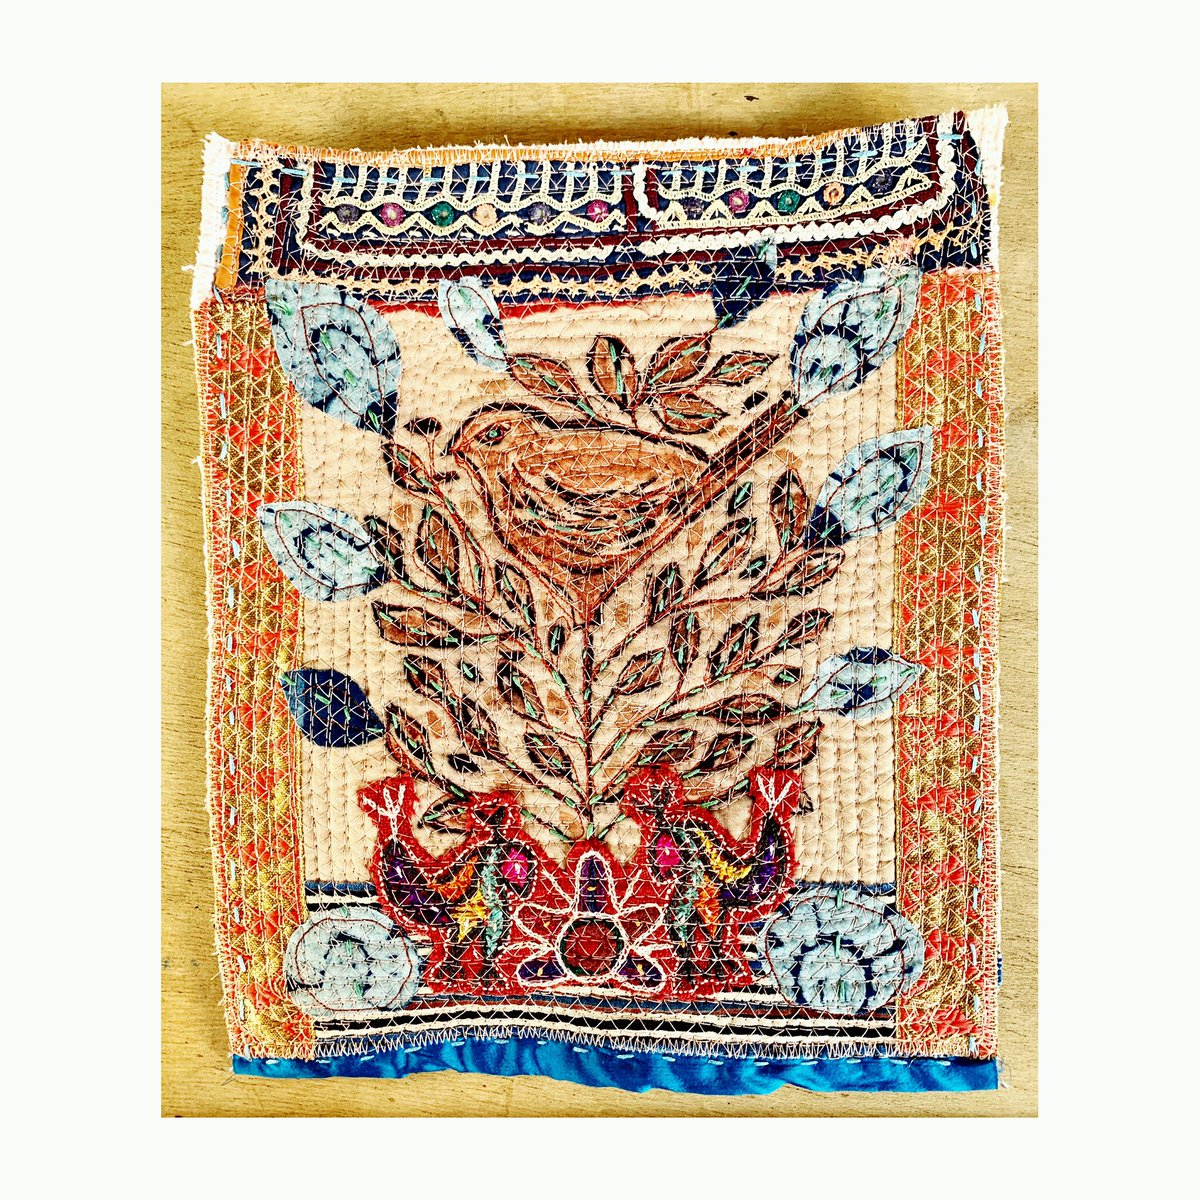 #quarantinequilt #wip #birdtree #textilecollage #textilefolkart #artistlife pic.twitter.com/V2NaHQUEdg